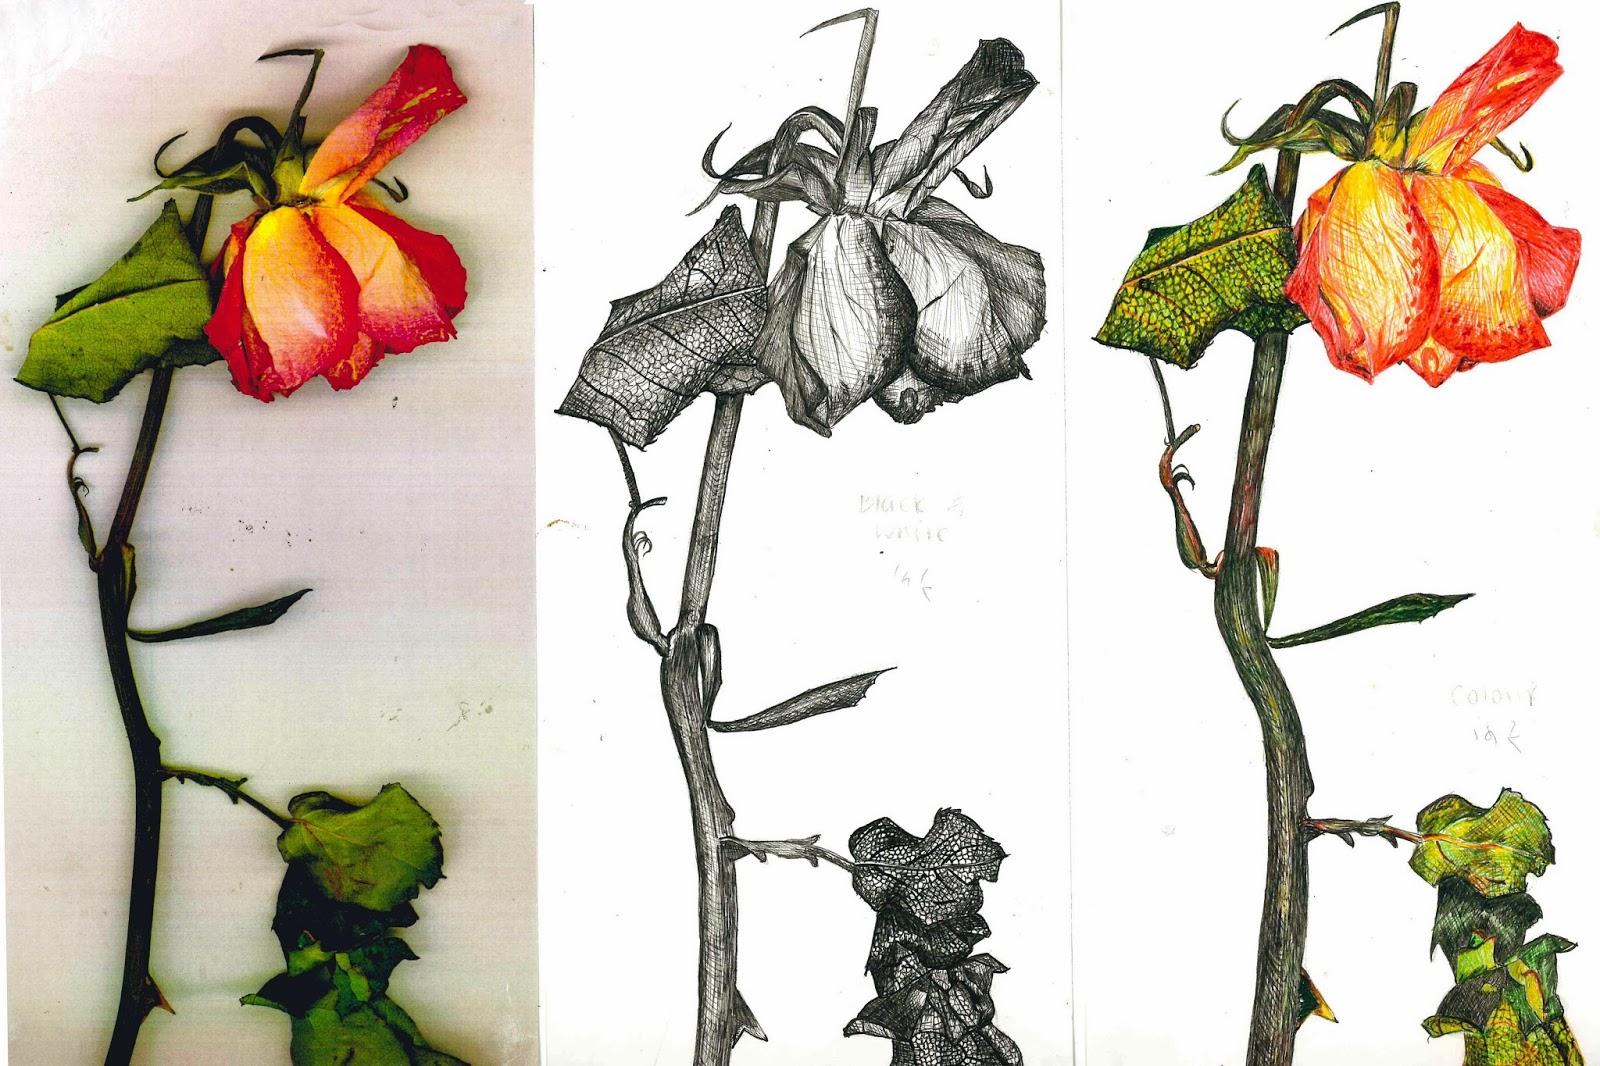 Drawn rose bush wilted flower A &  Design Ceramics: